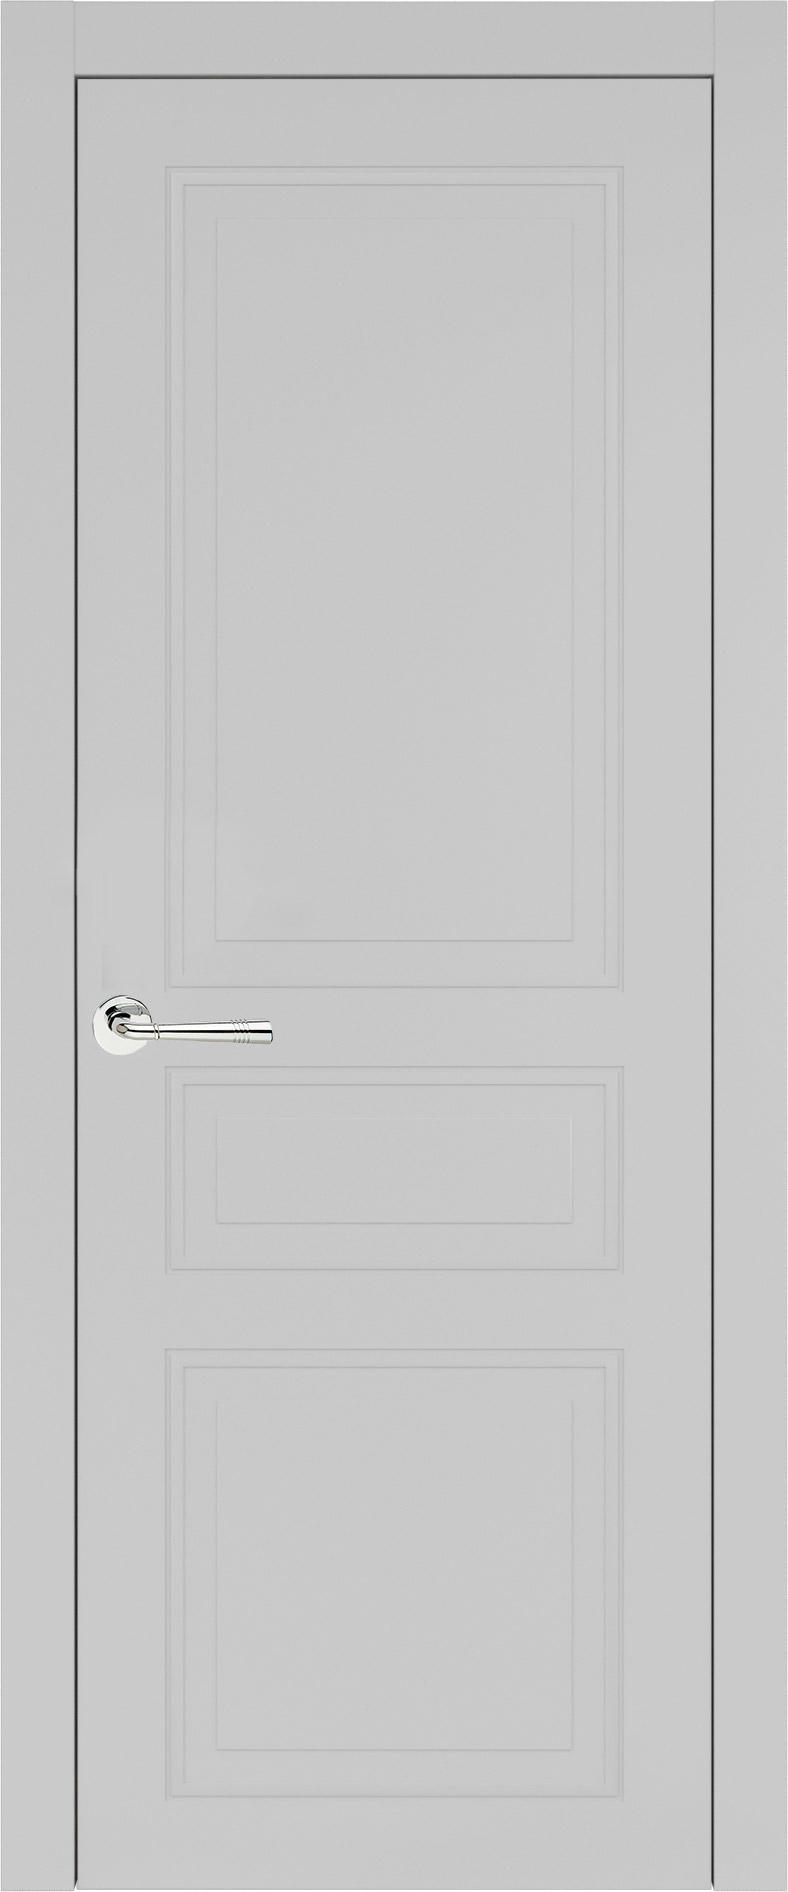 Imperia-R Neo Classic цвет - Серая эмаль (RAL 7047) Без стекла (ДГ)